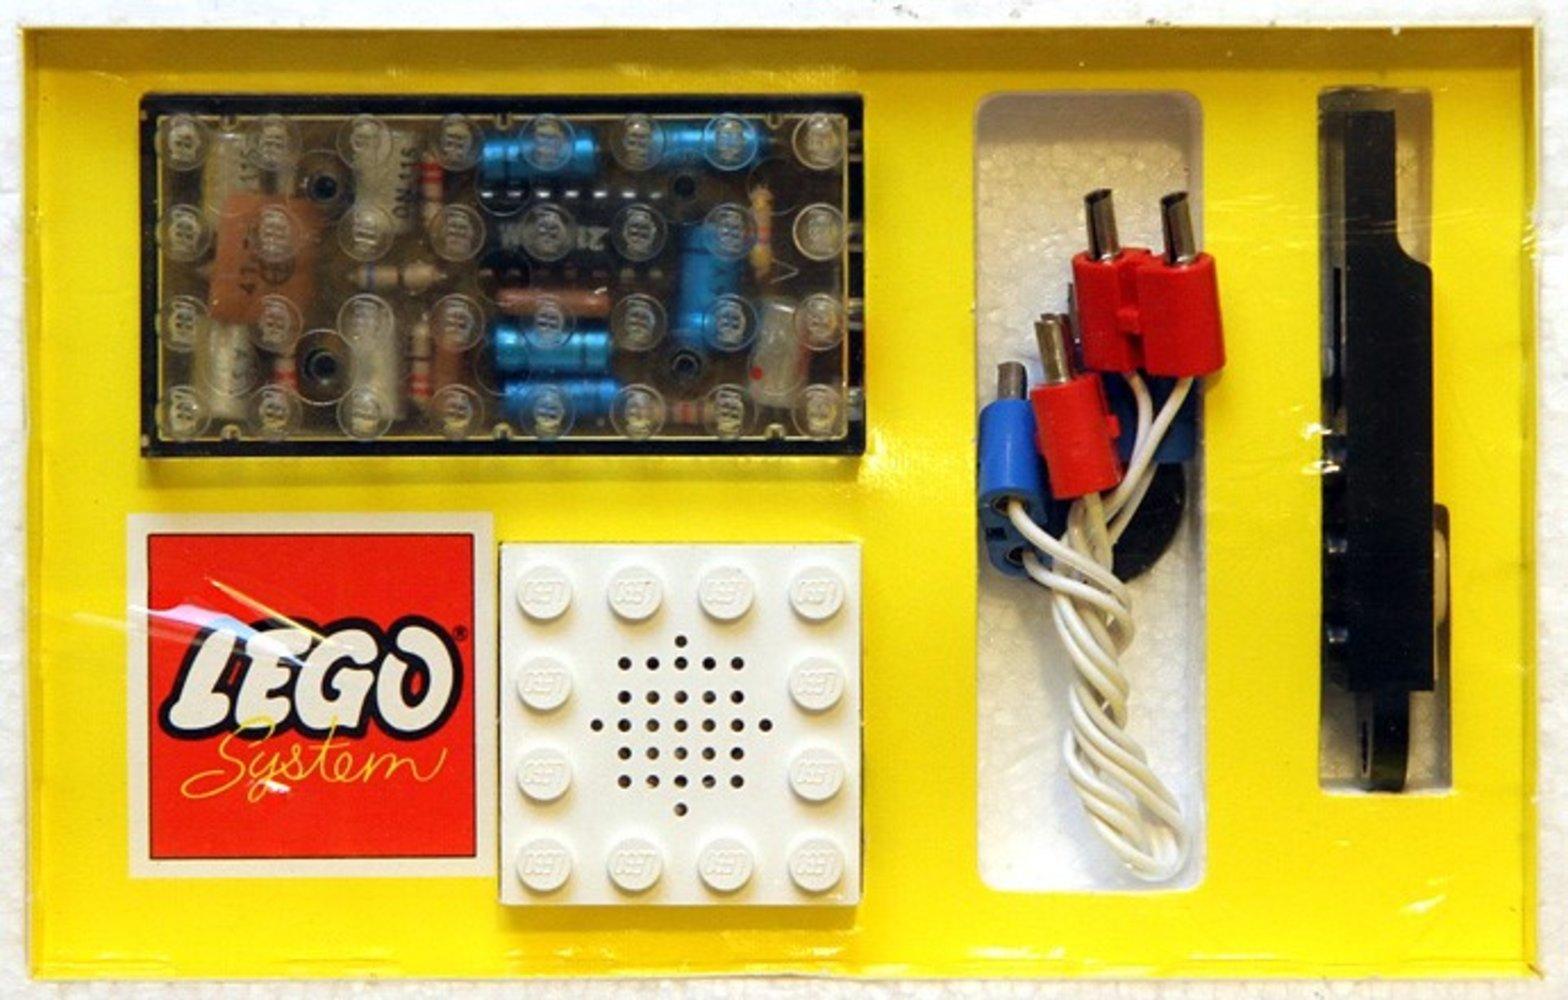 Electronic Control Unit (Forward/Backward - Stop)